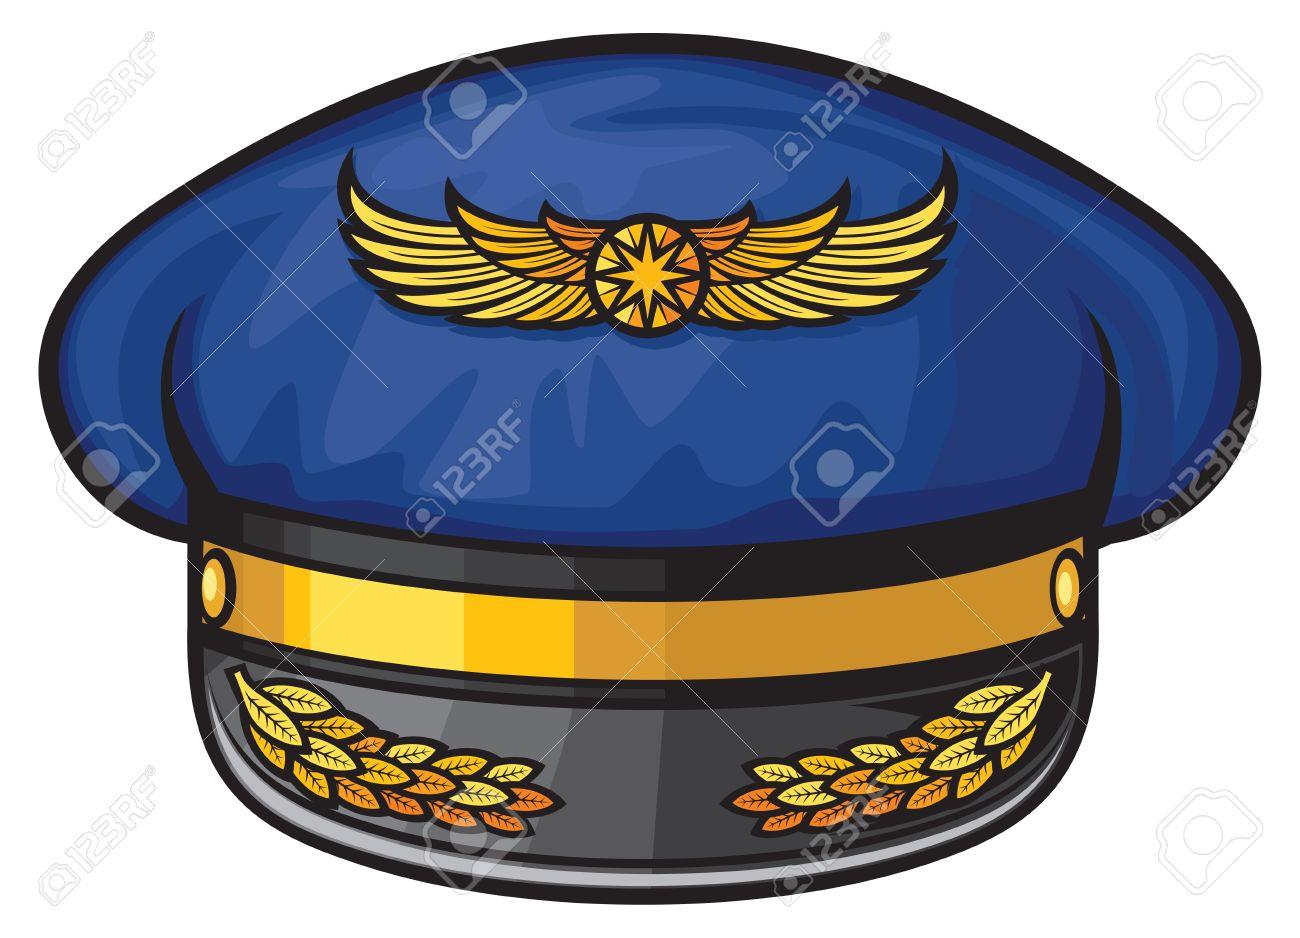 Sombrero De Pilotos De Líneas Aéreas (sombrero De Piloto, Gorra De ...